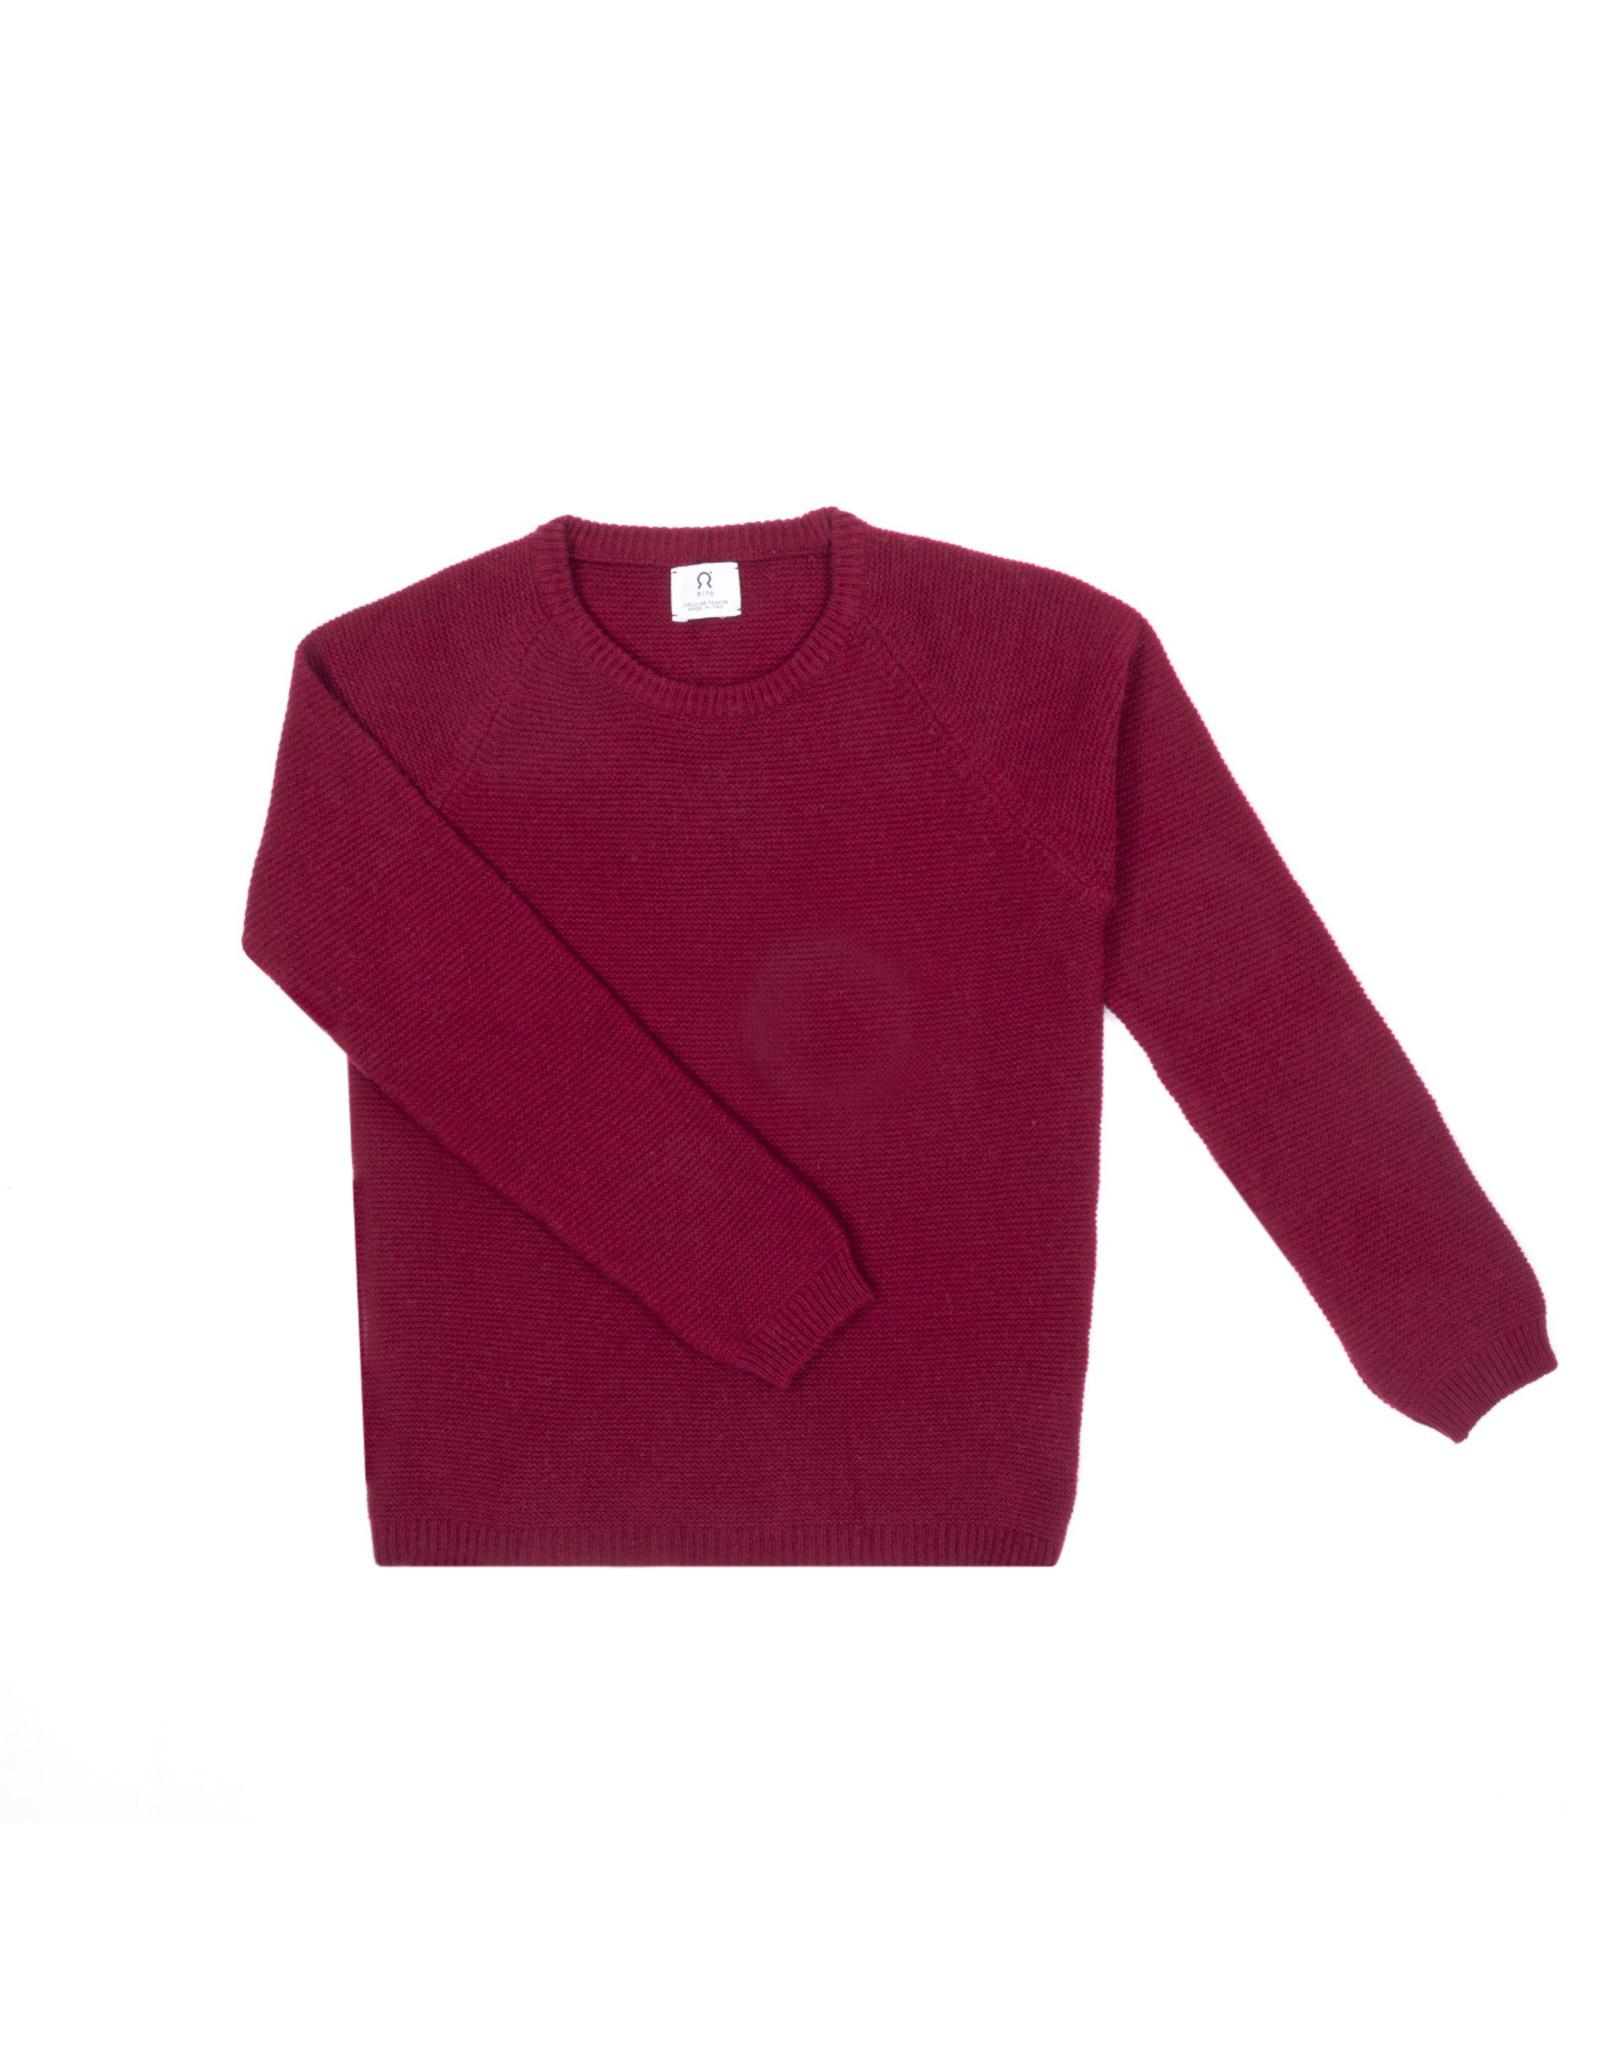 Rifò Recycled Cashmere Wool Sweater - Giulietta